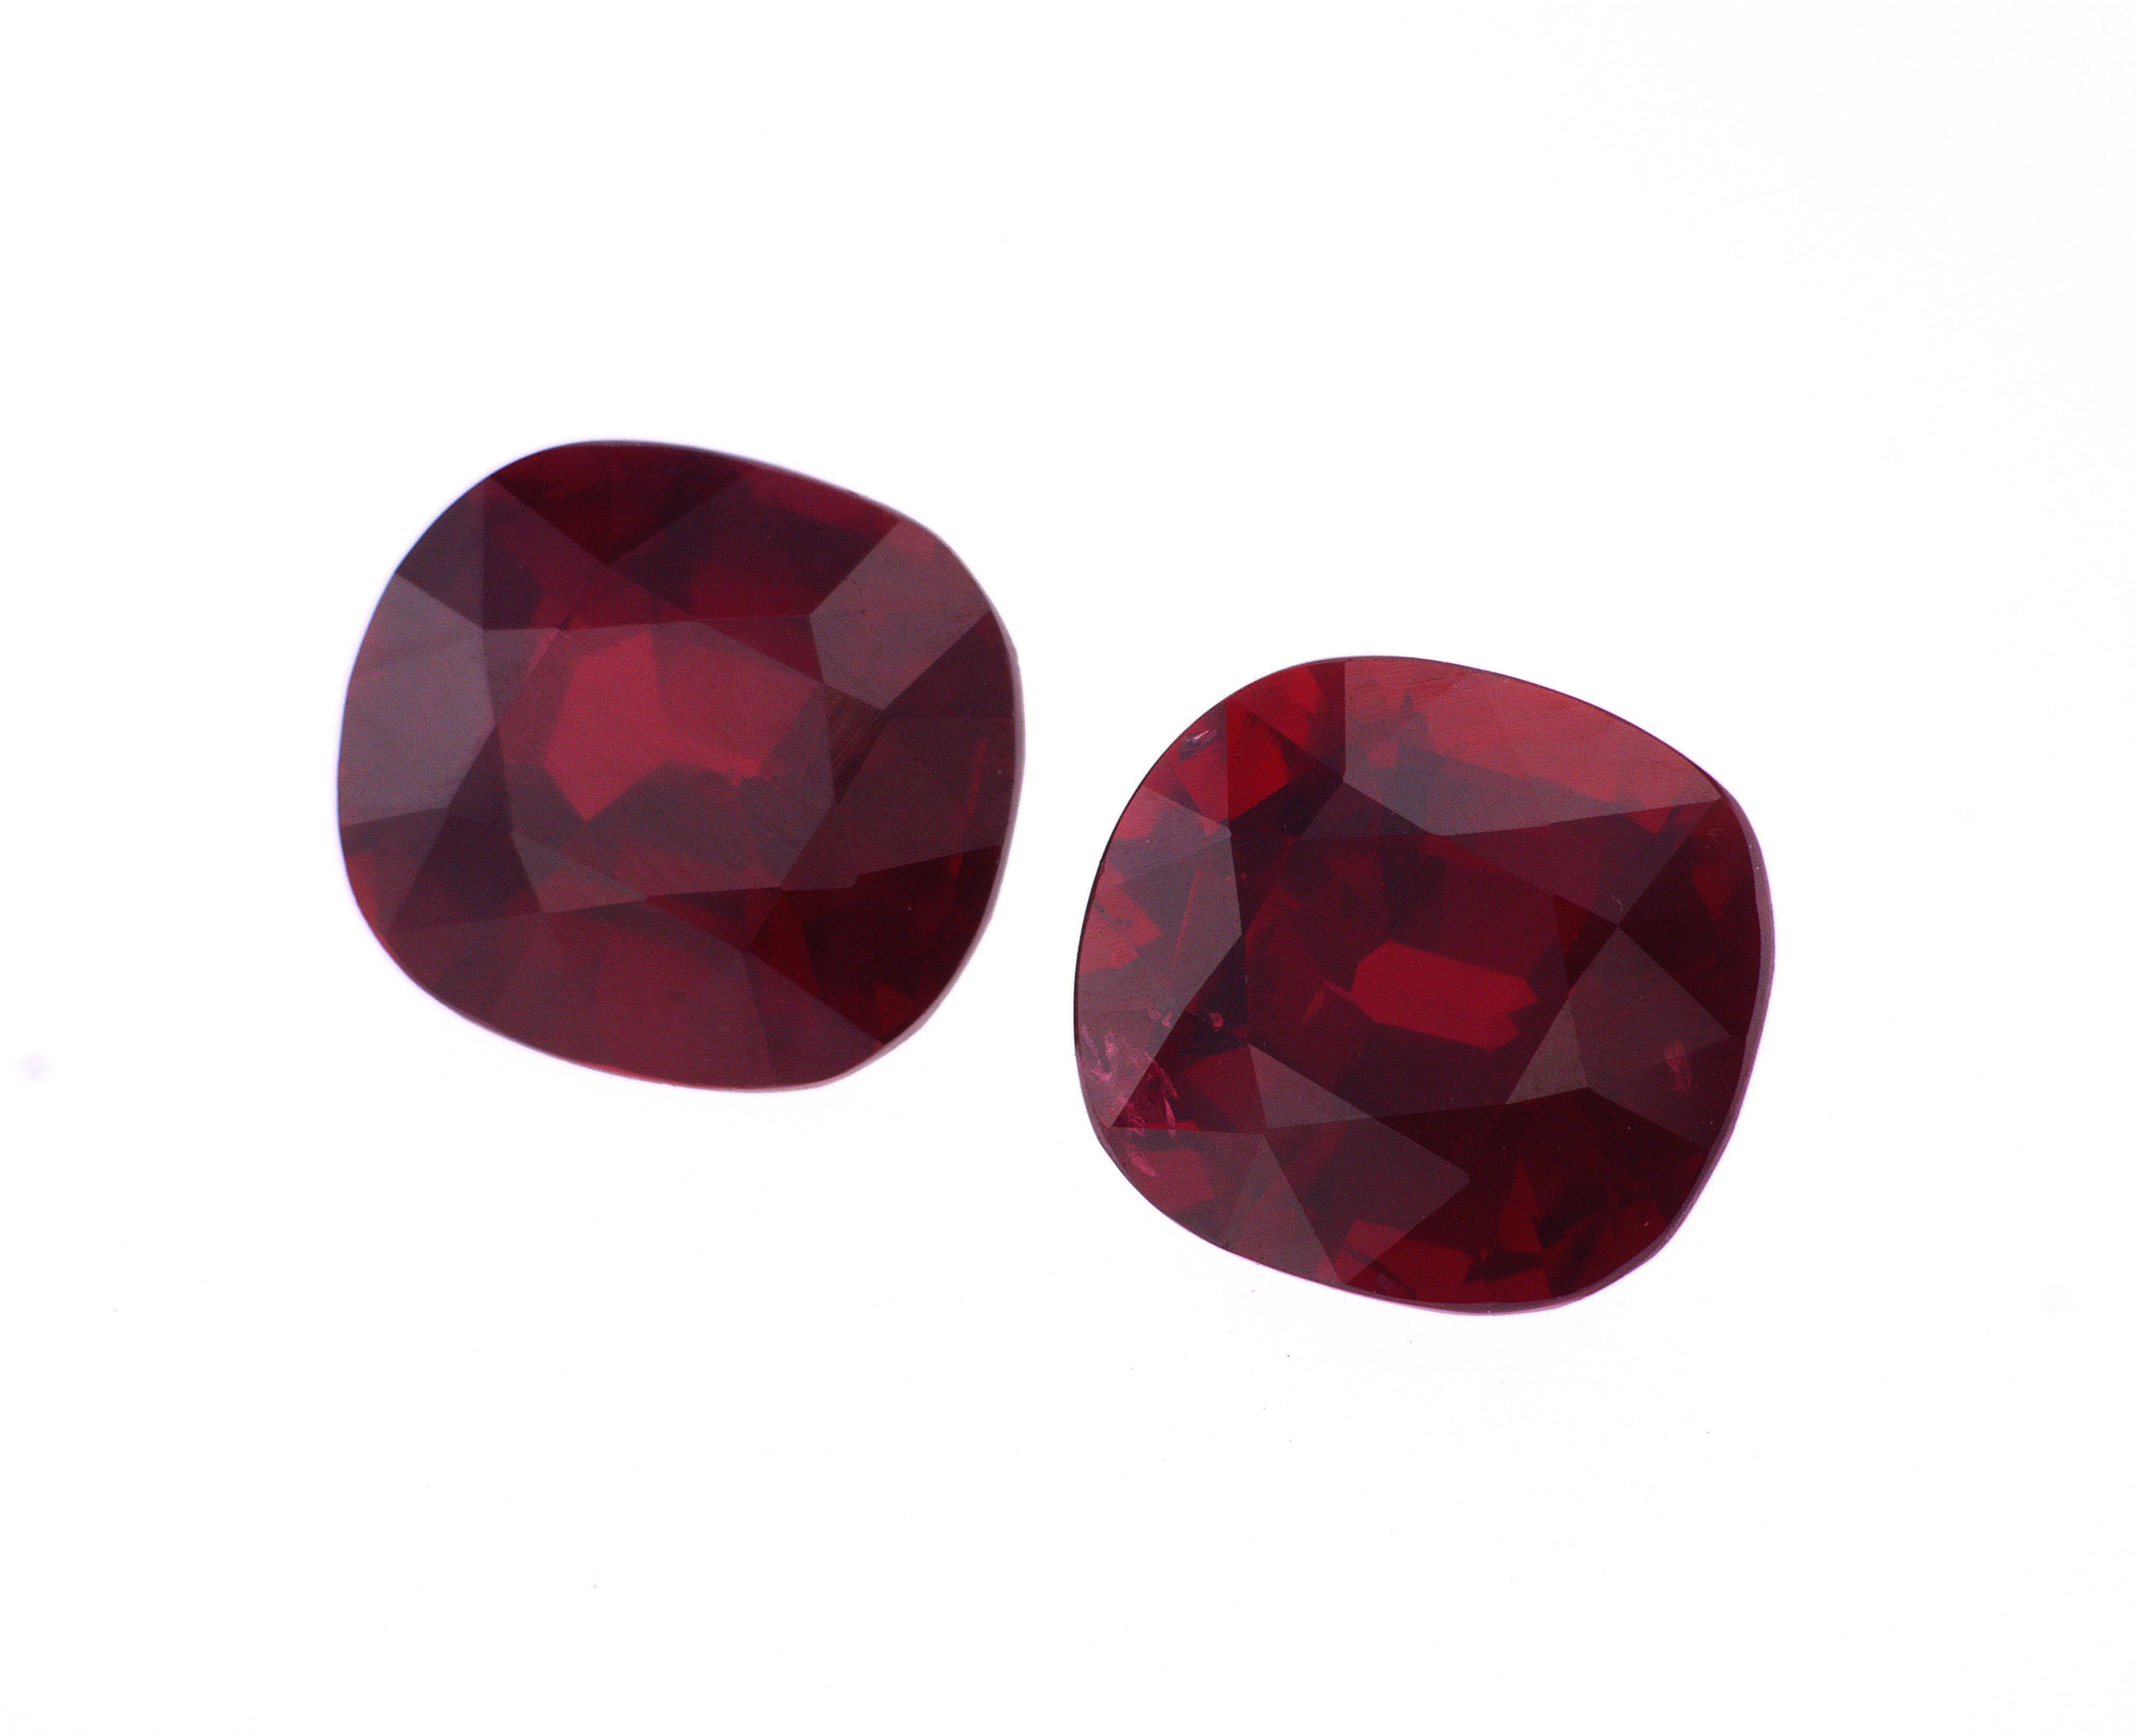 6.48 ct cushion red rubies